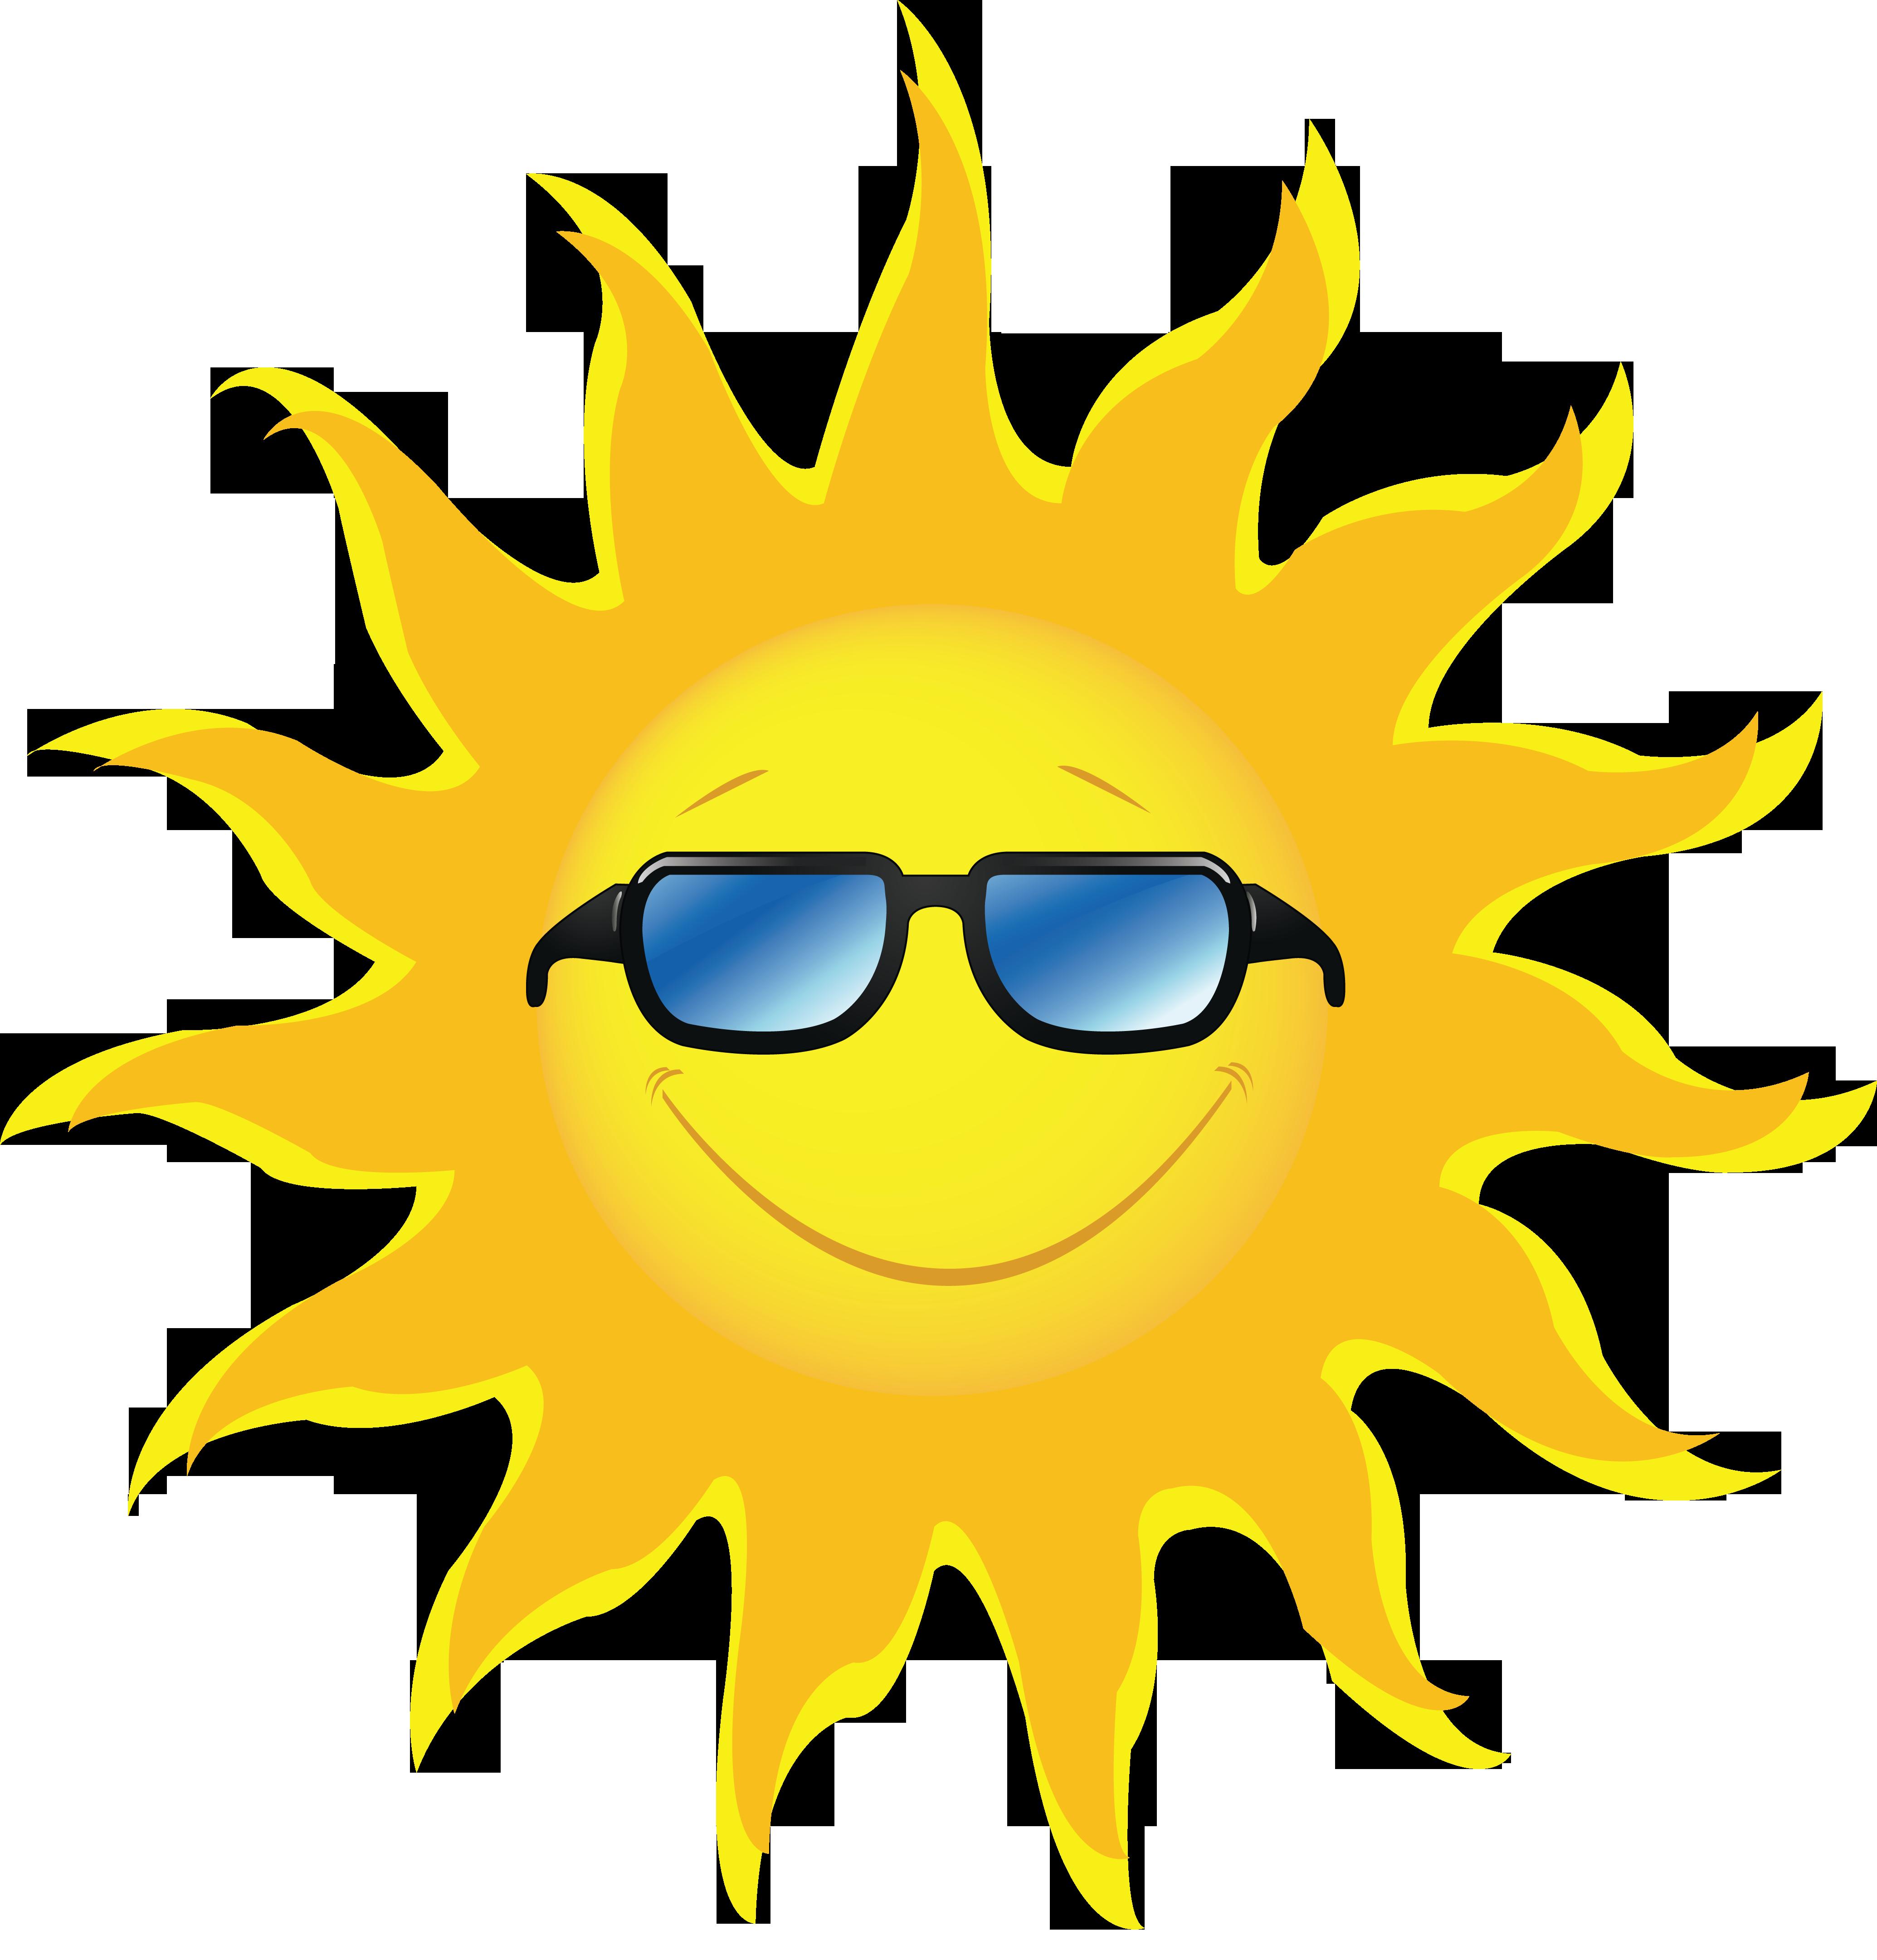 Sun Web Transparent Image